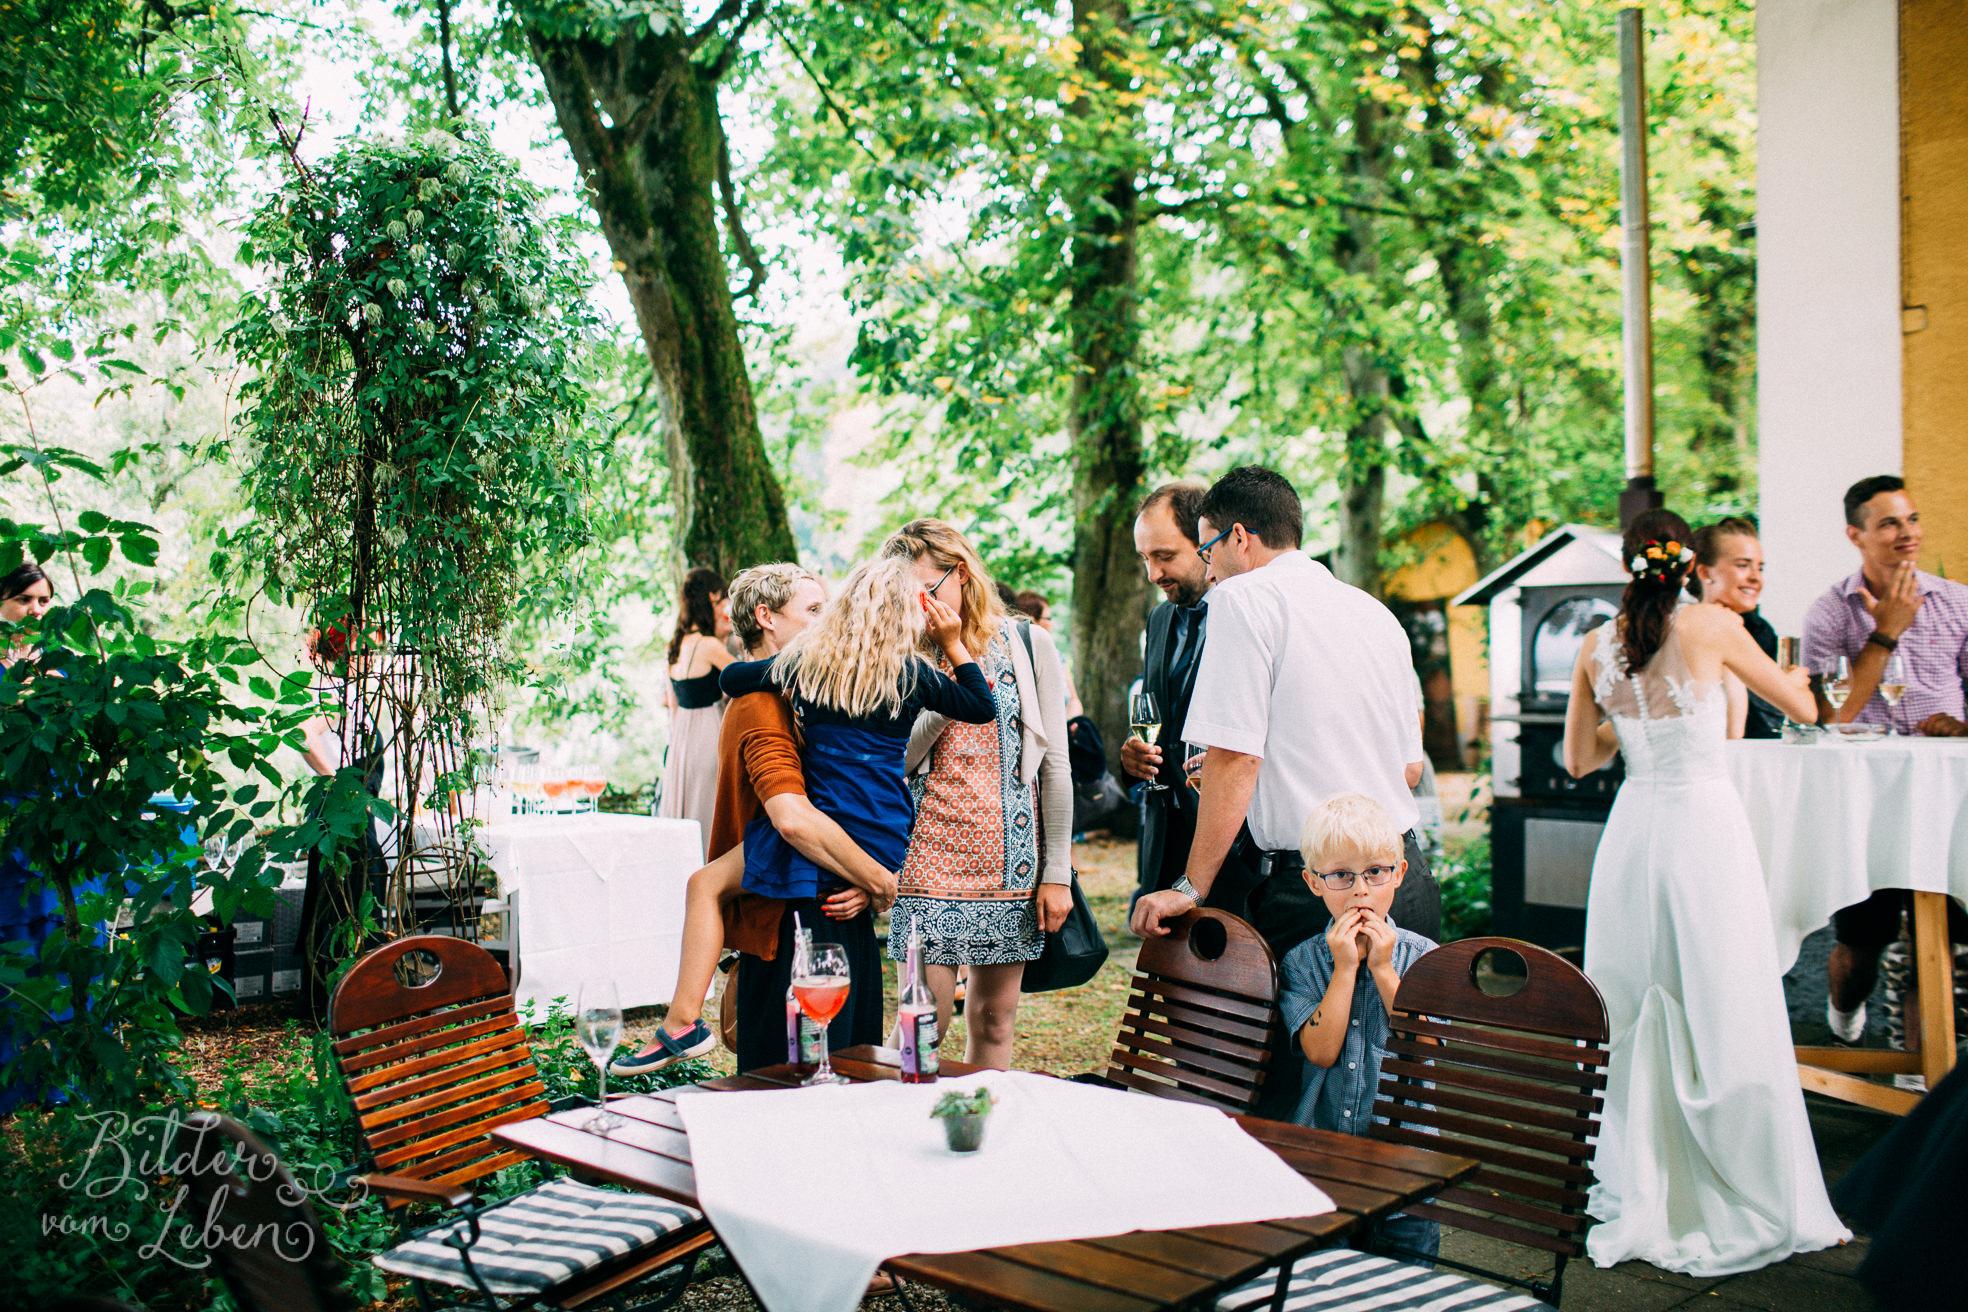 108BildervomLeben-Vintagehochzeit-Noerdlingen-2016